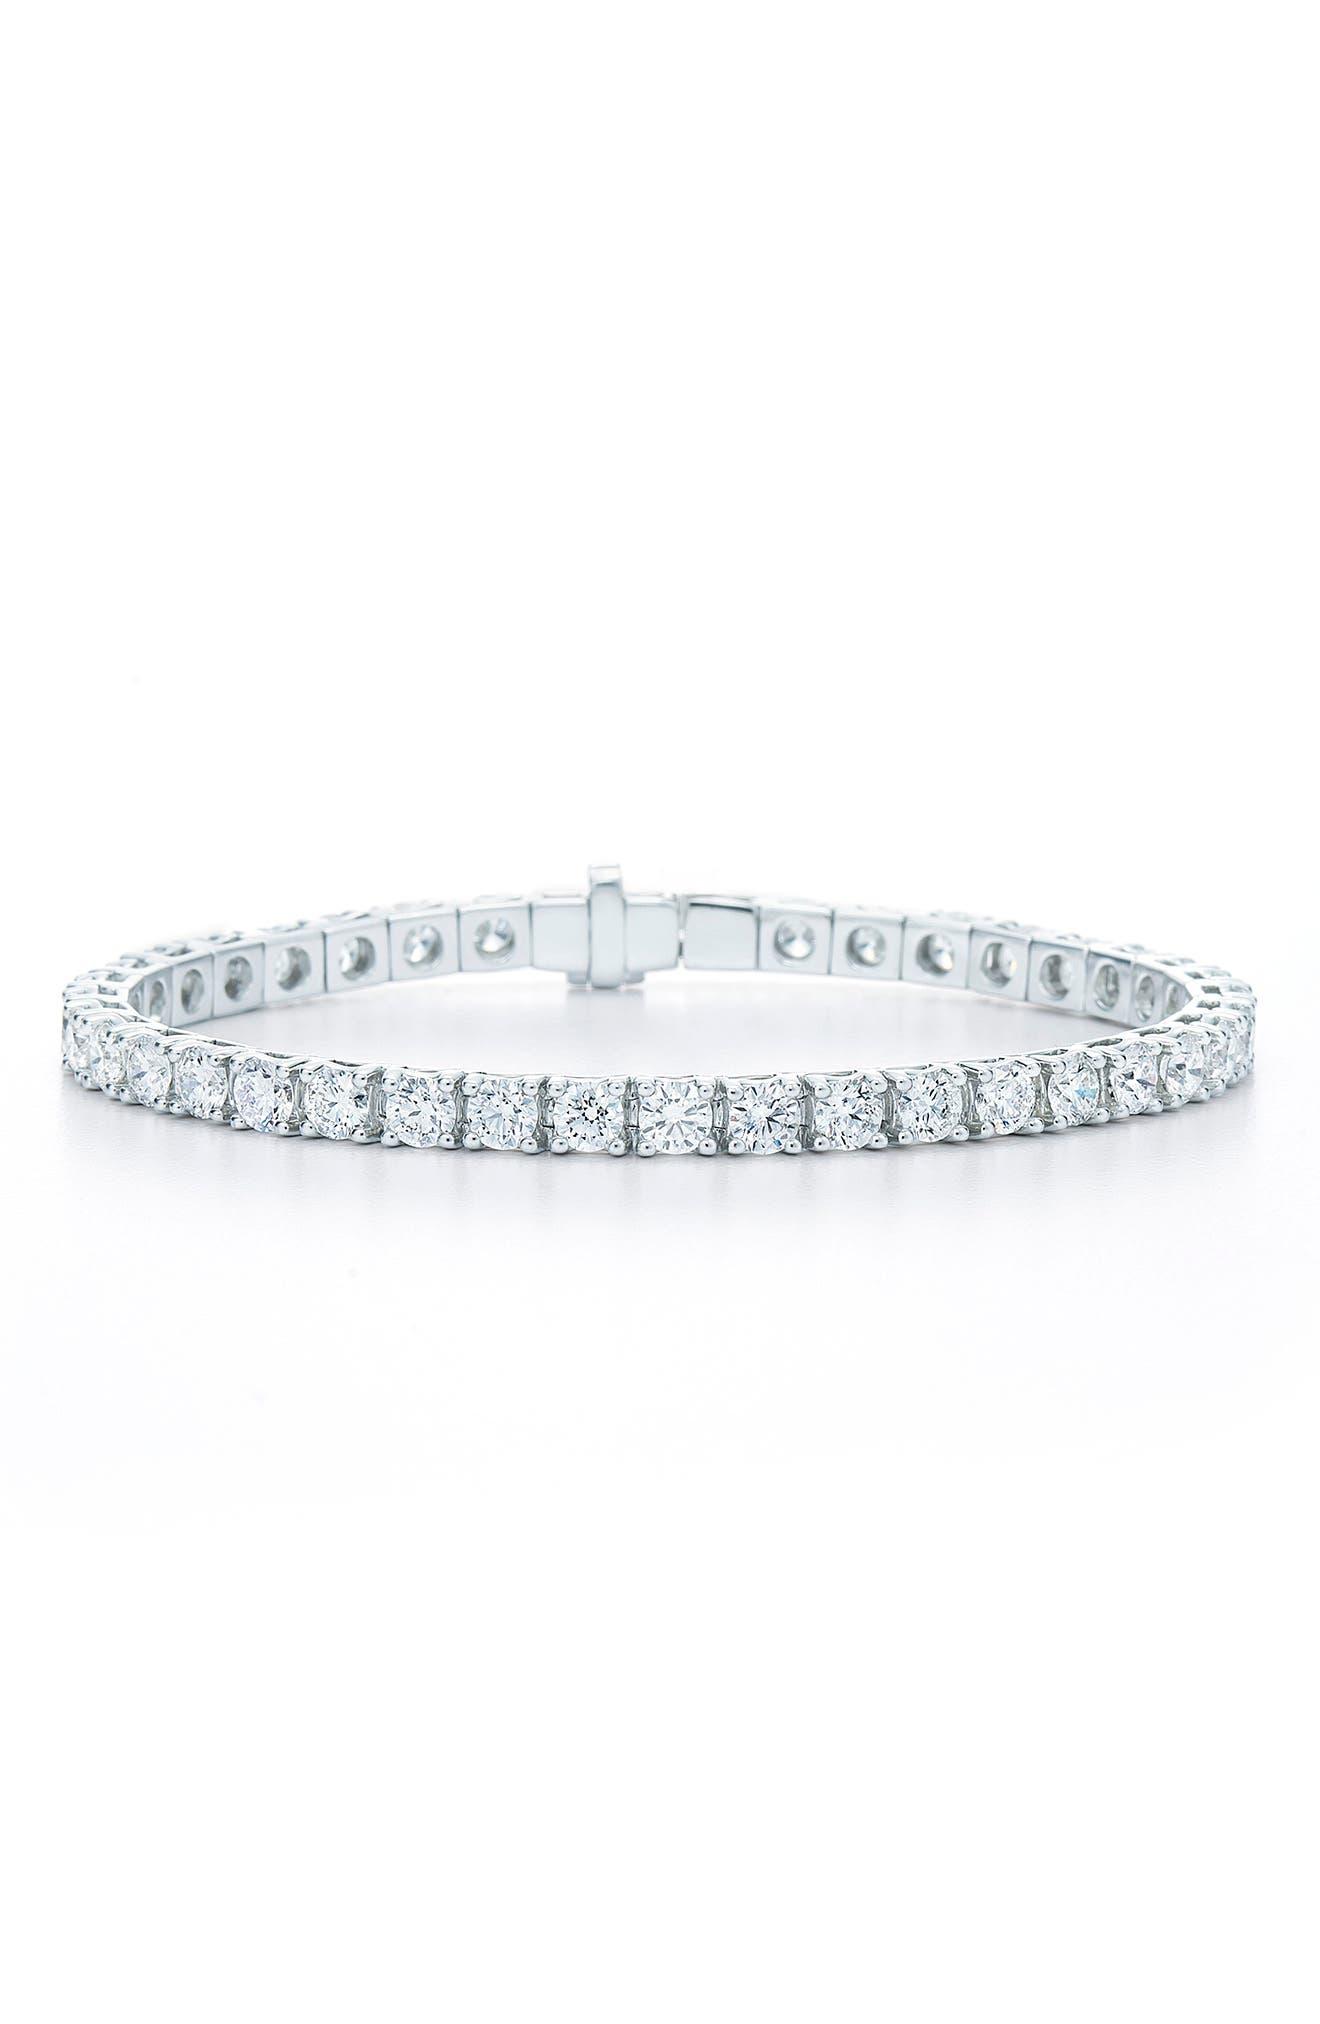 Riviera Diamond Line Bracelet,                             Main thumbnail 1, color,                             WHITE GOLD